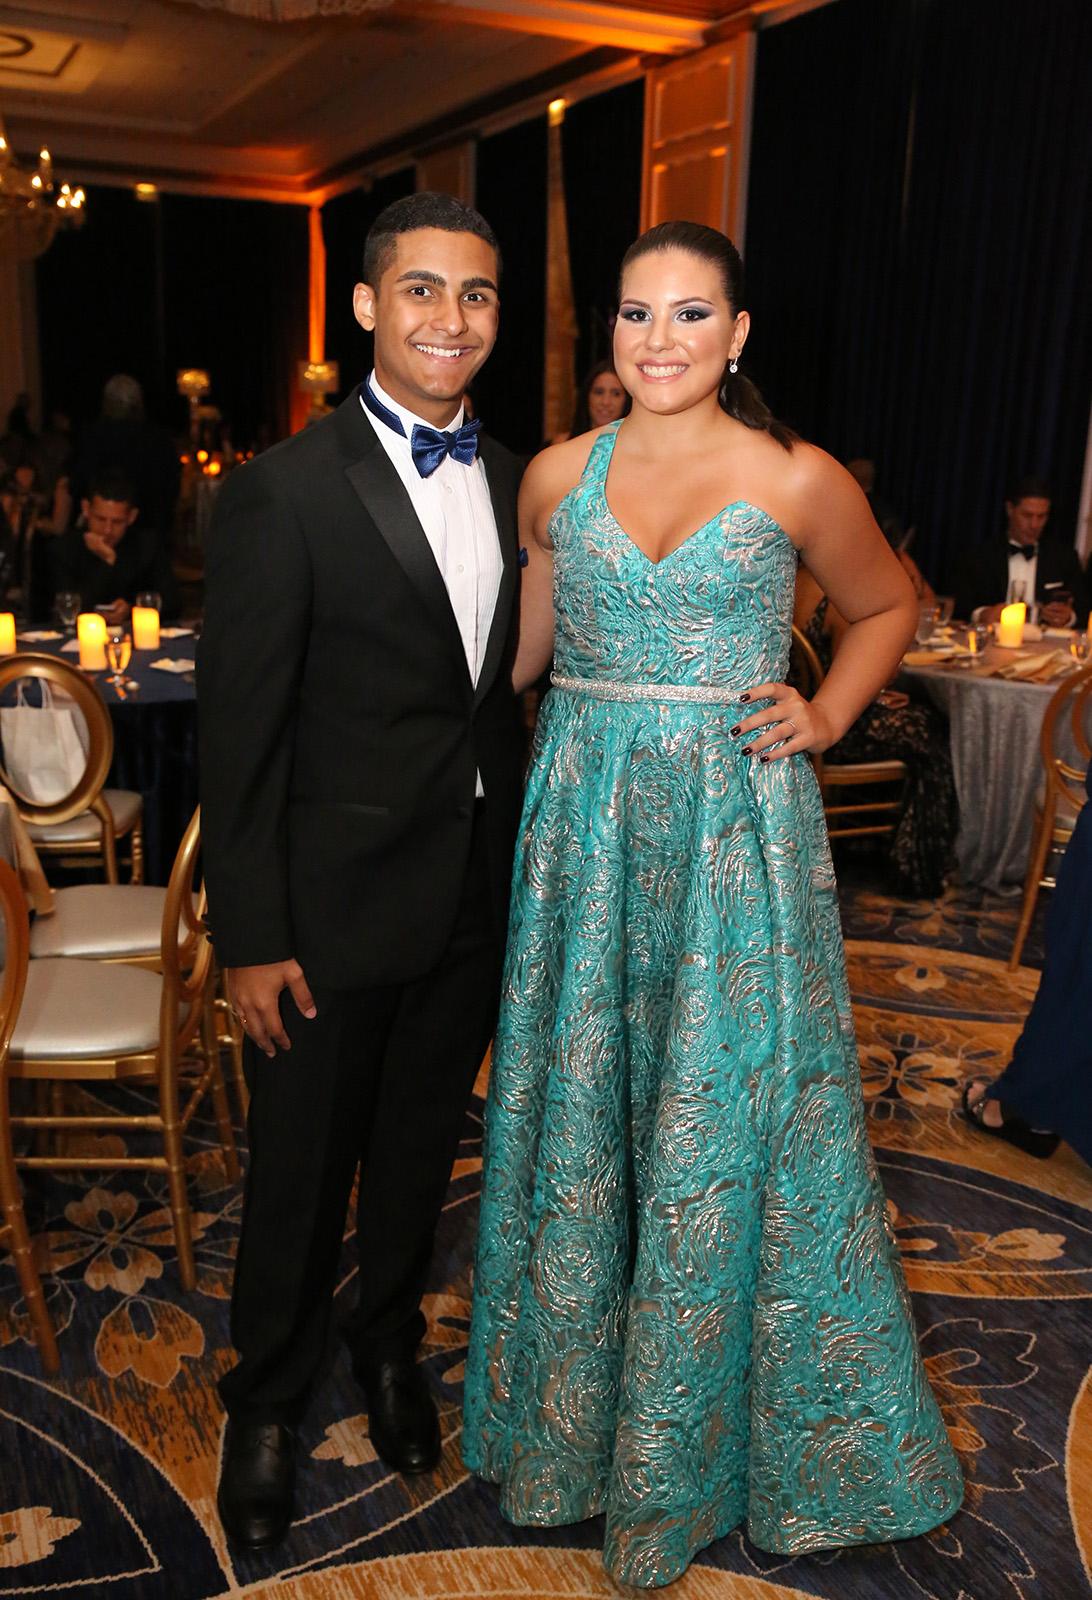 Samuel Maduro y Janina Lugo. (José R. Pérez Centeno)